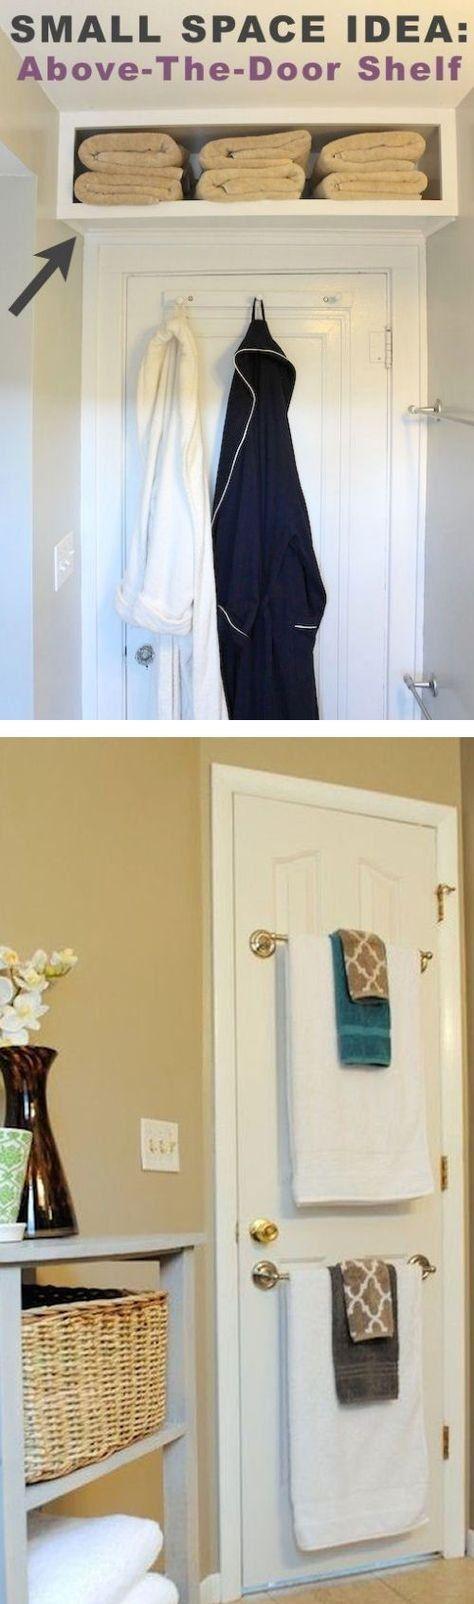 Photo of 40+ best Ideas small bathroom organization ideas diy space saving – Image 21 of 25 #bathroomstorageideas